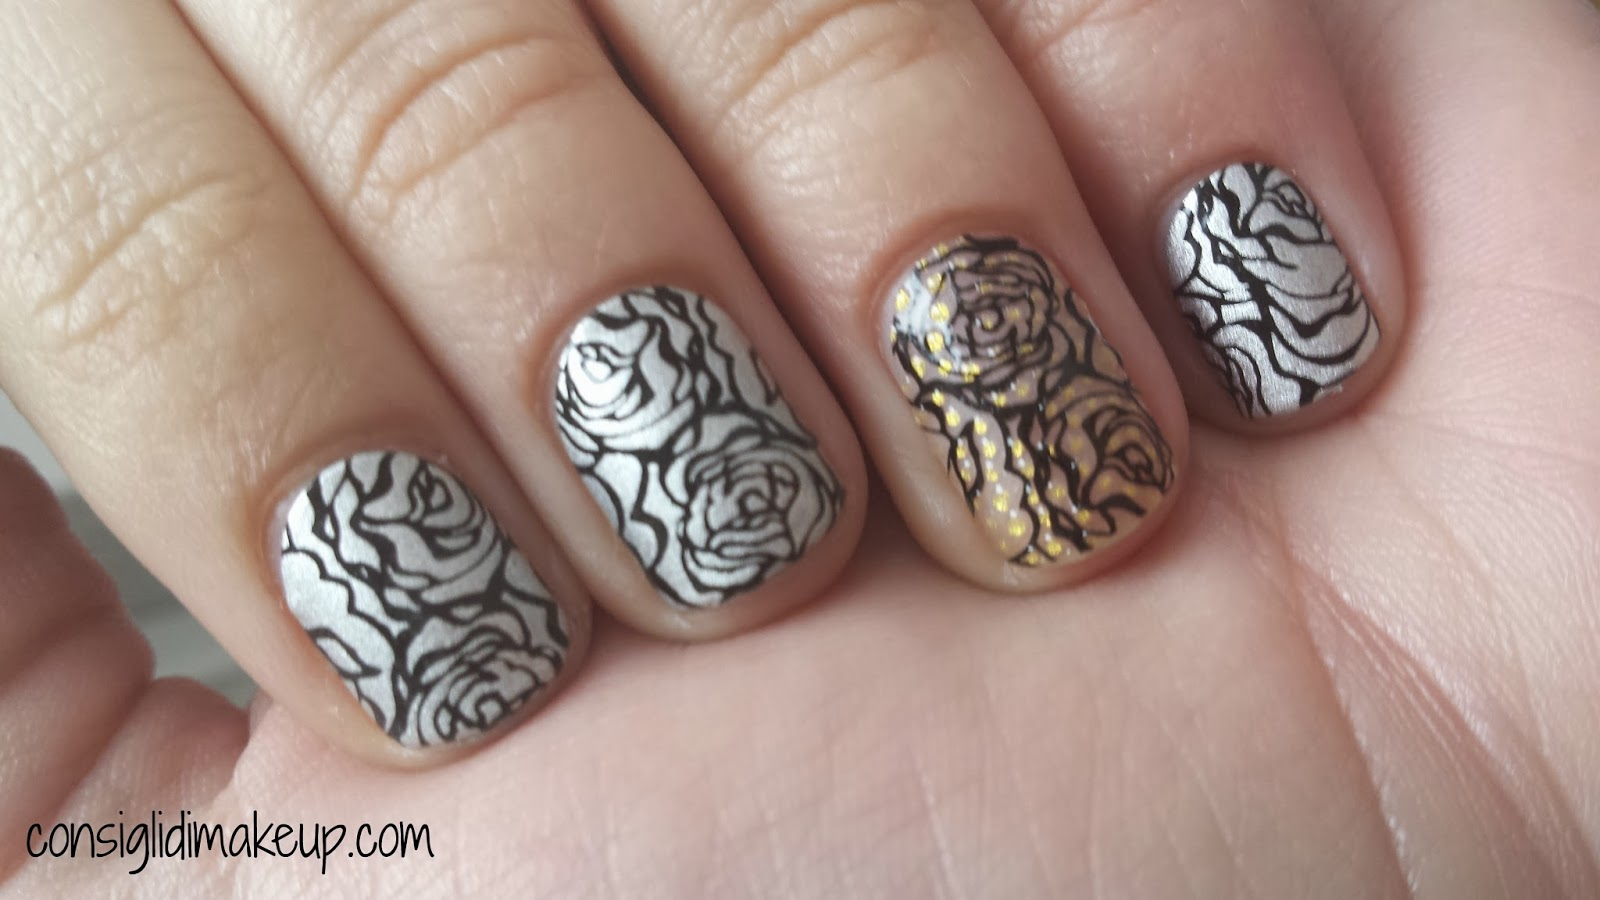 NOTD: Nail Art Dozen Roses - Avon